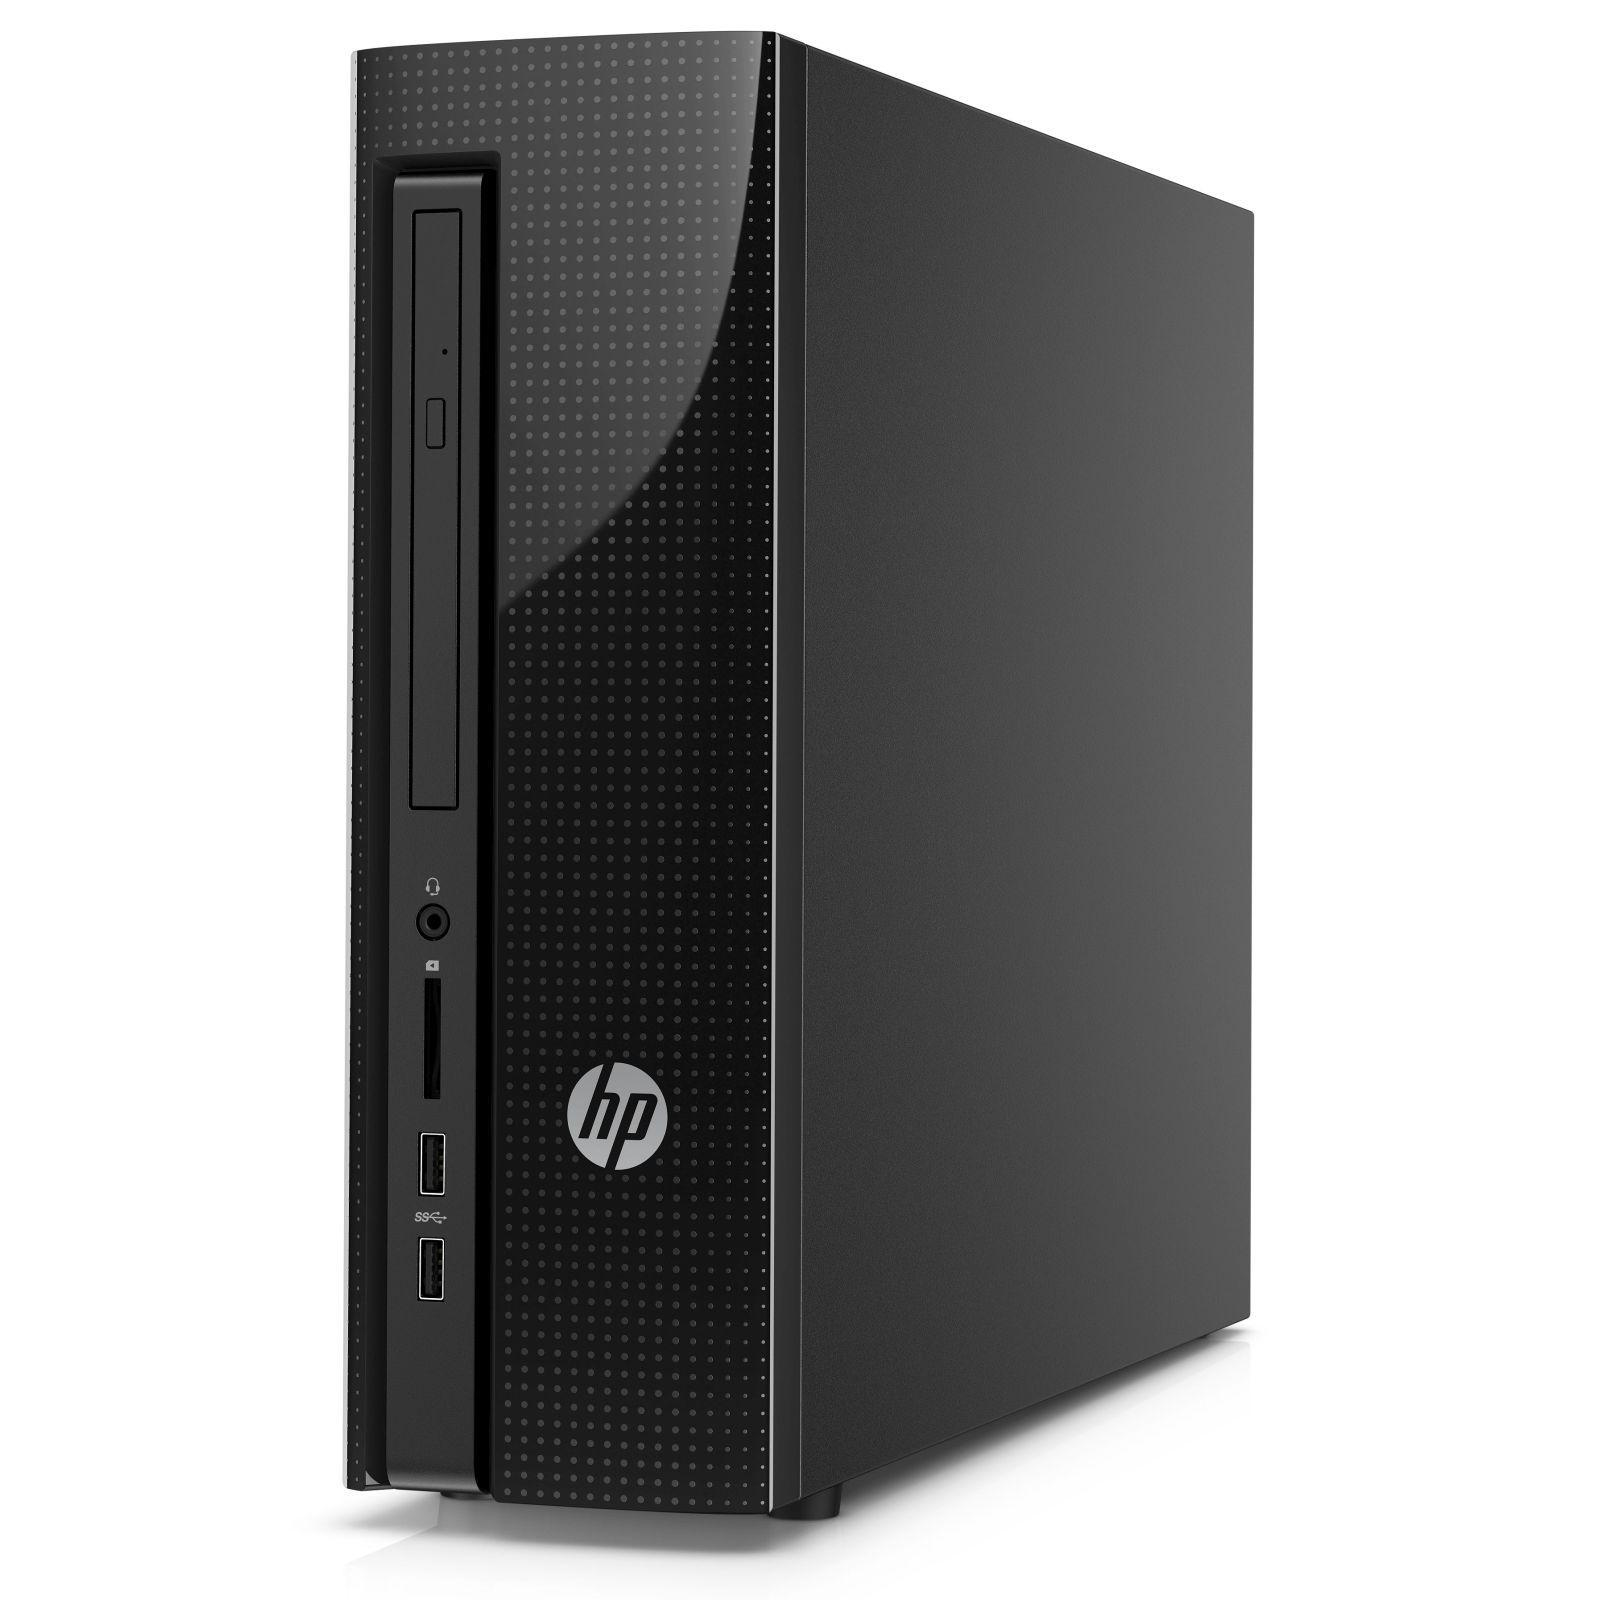 HP Slimline 270-p026d DT PC